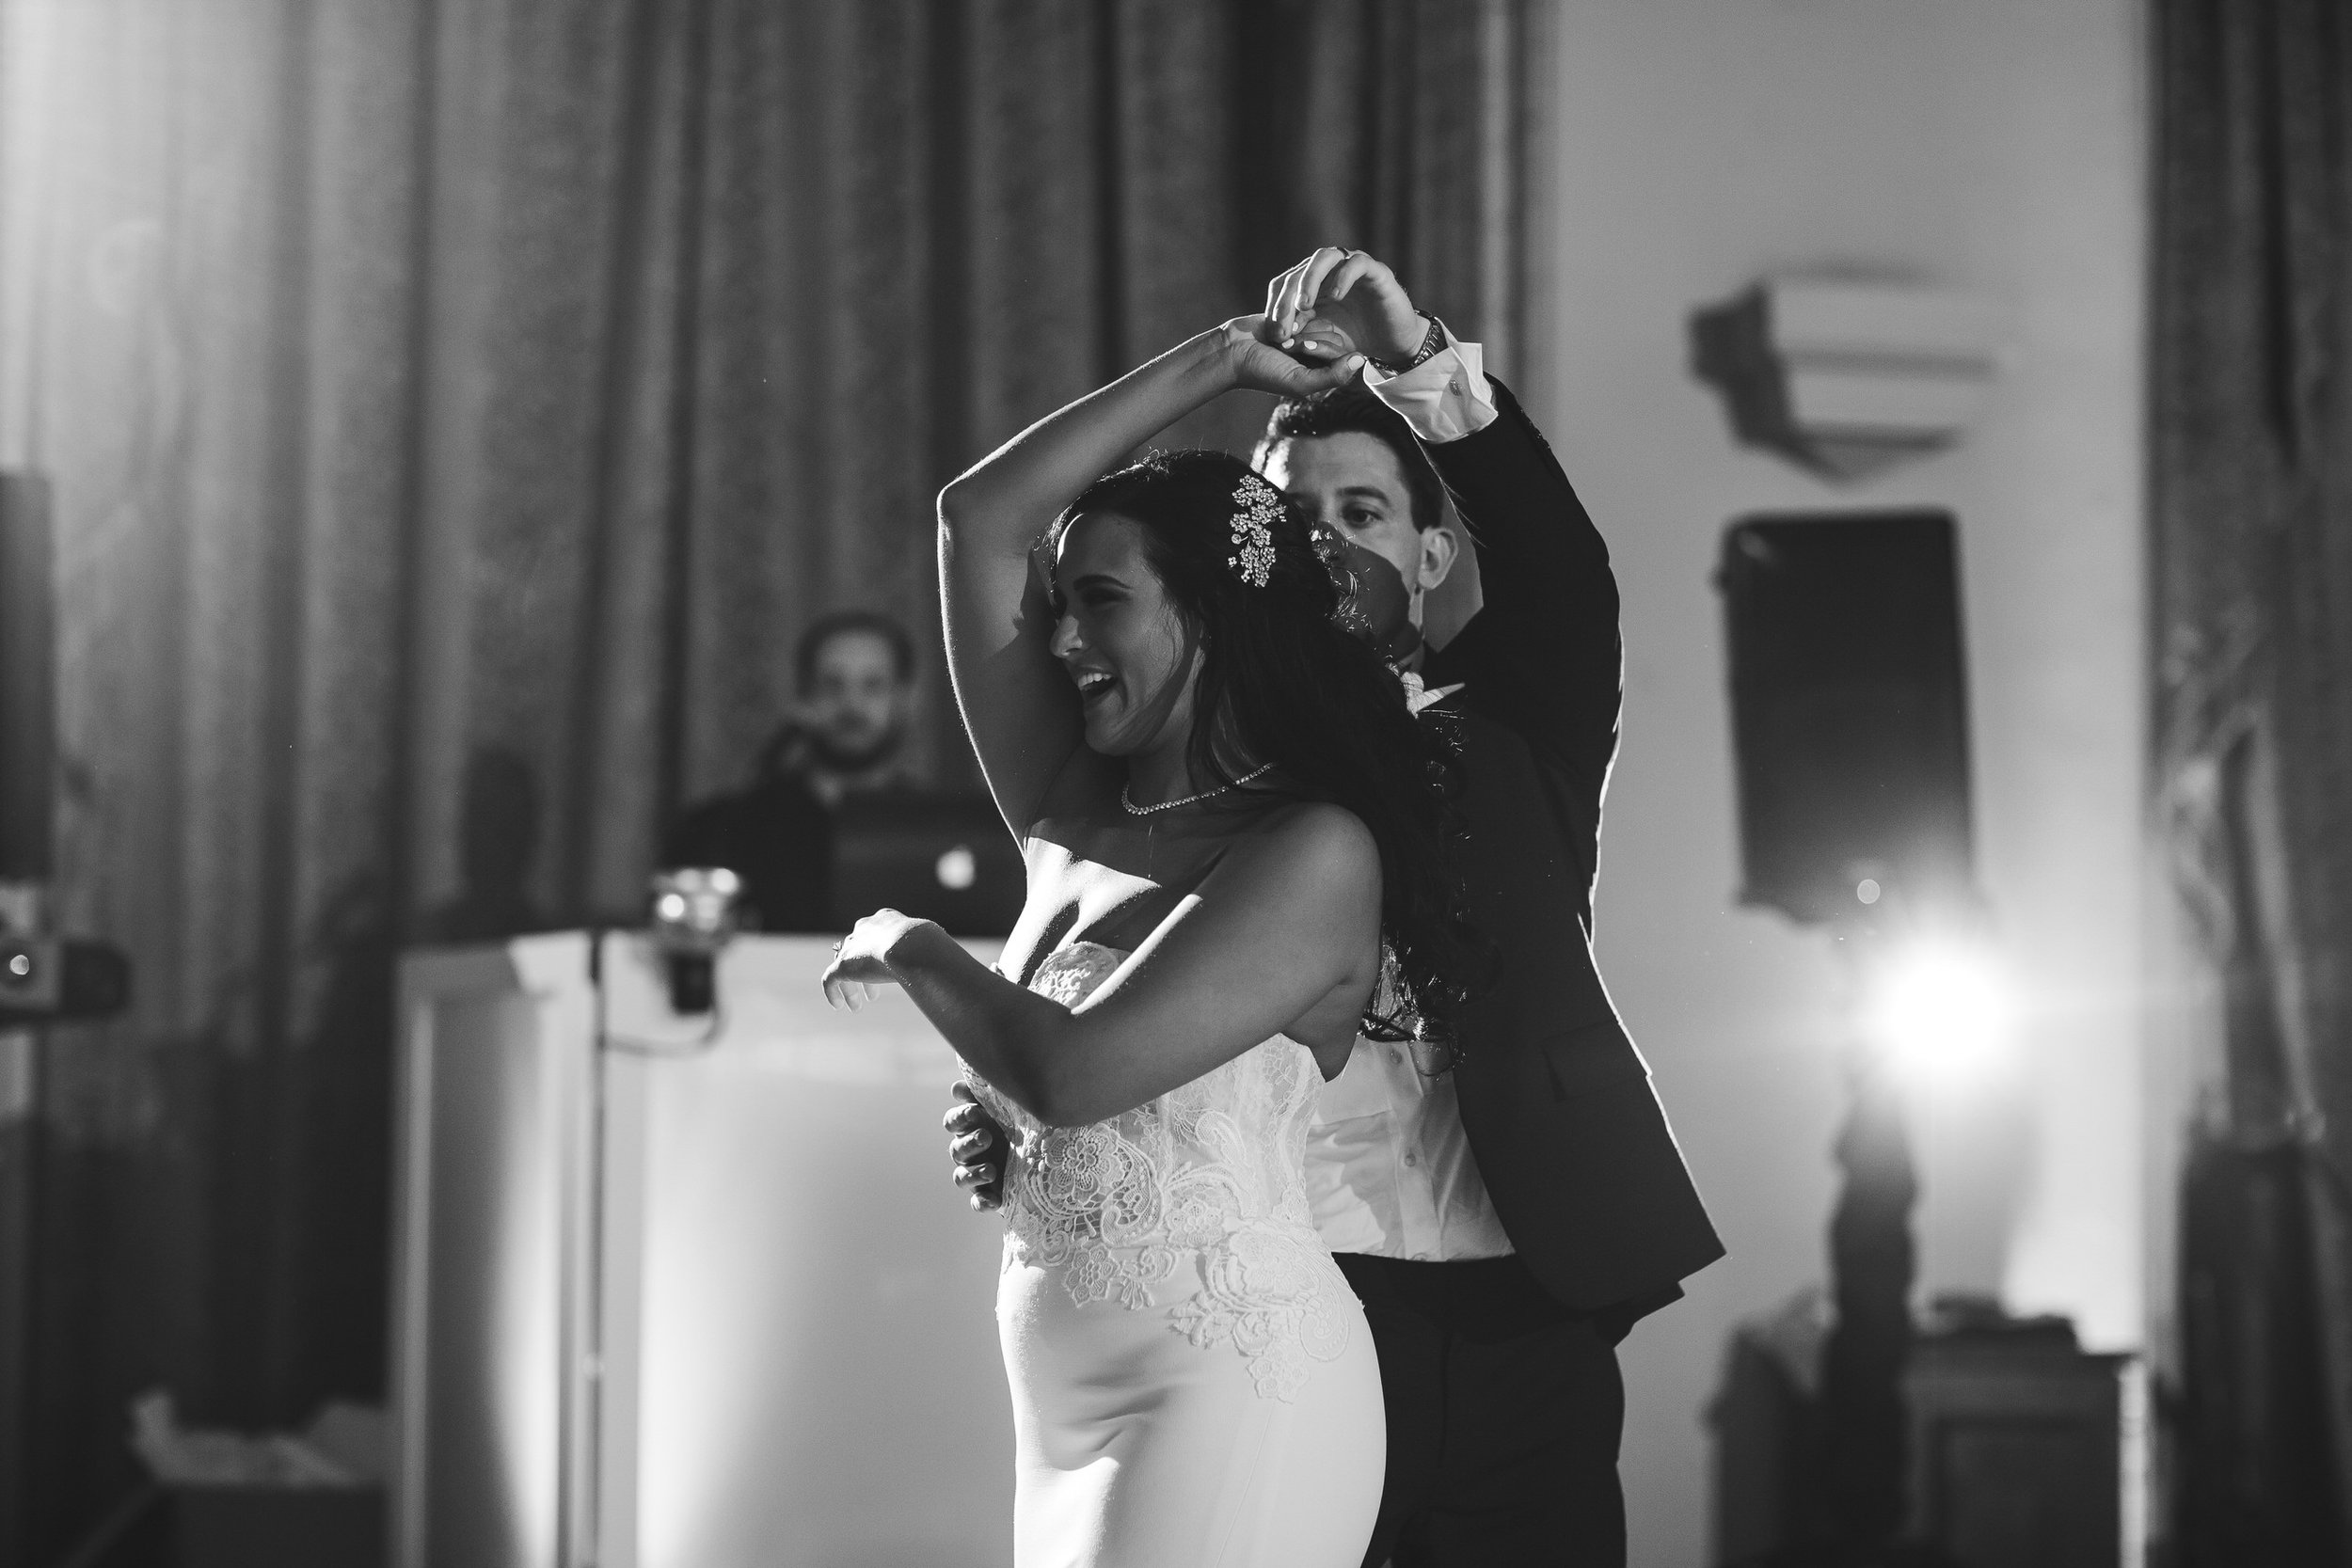 miami-biltmore-wedding-photographer-reception-party-31.jpg